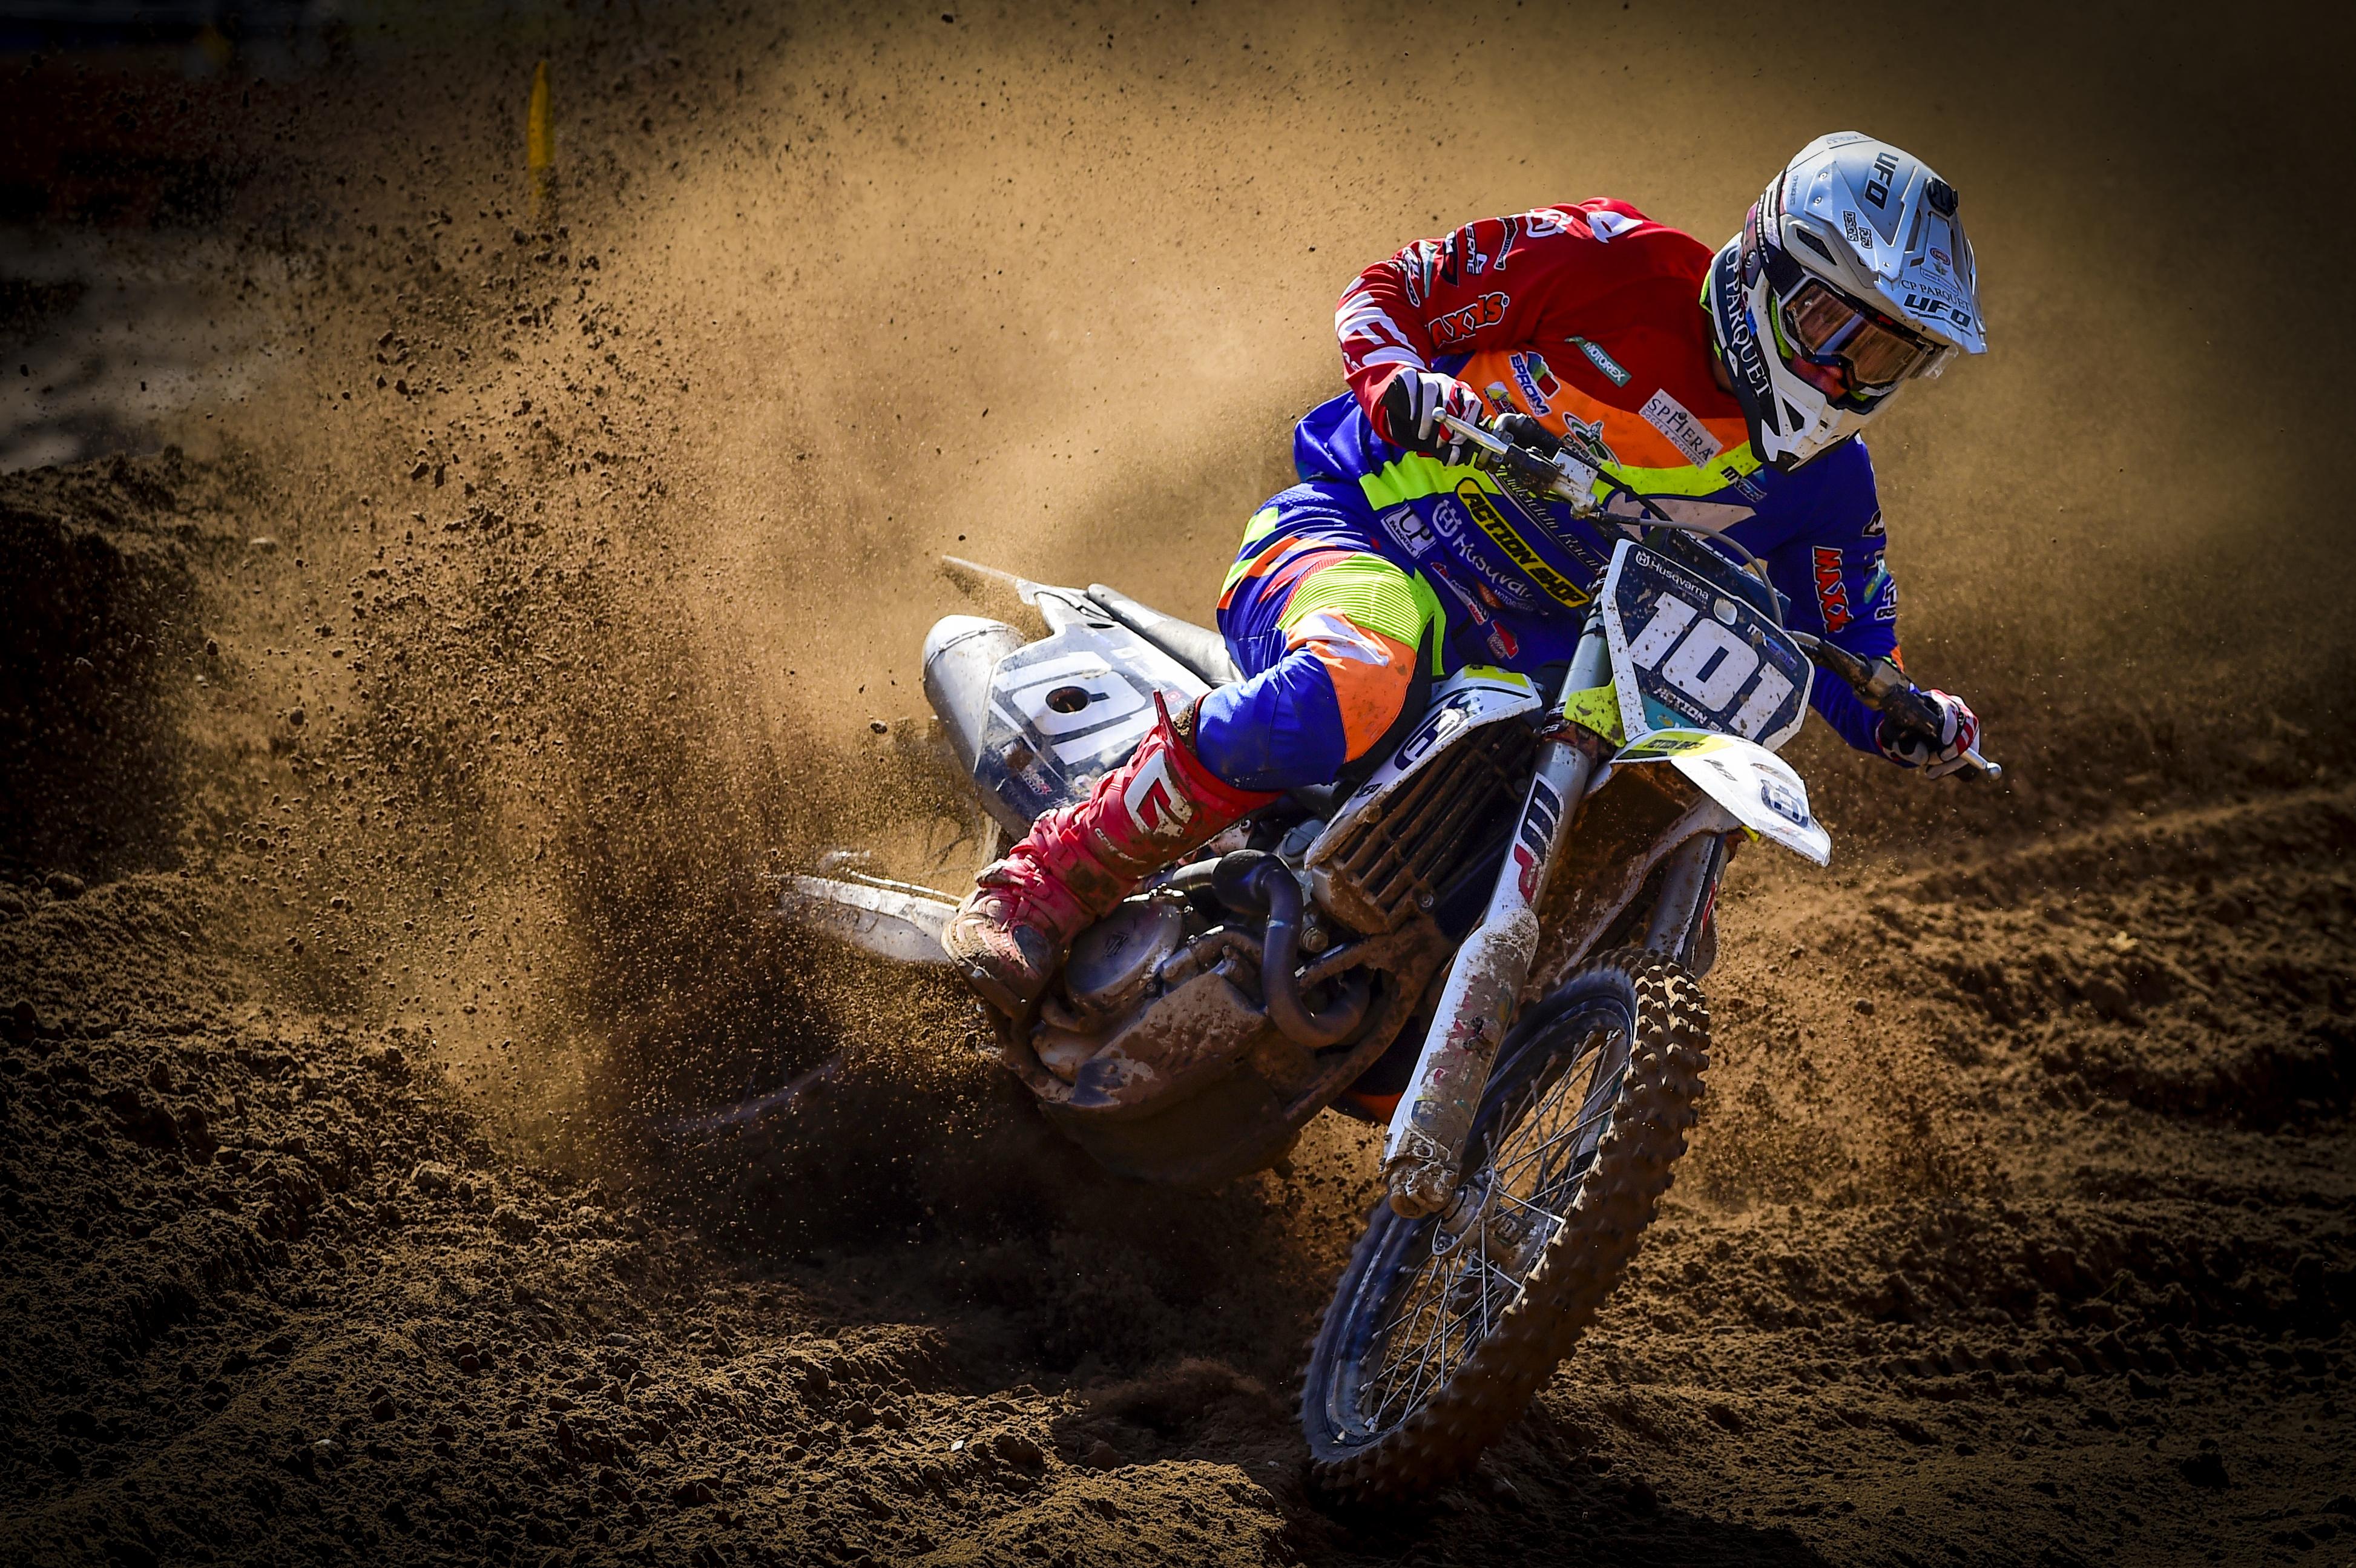 Best Motocross Tracks in South East England